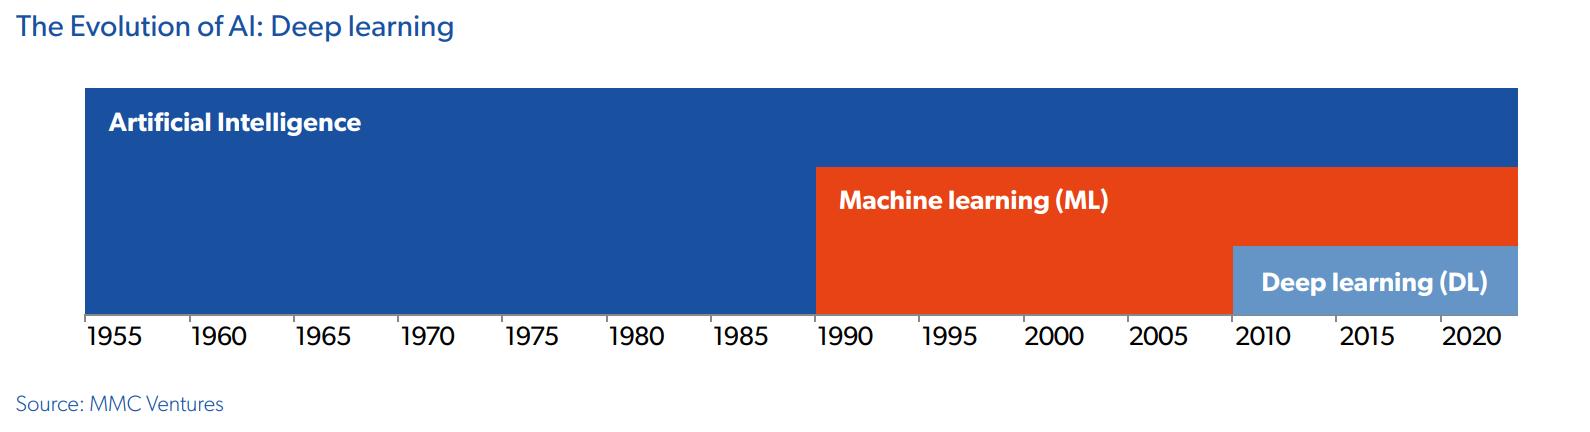 the evolution of ai mmc ventures